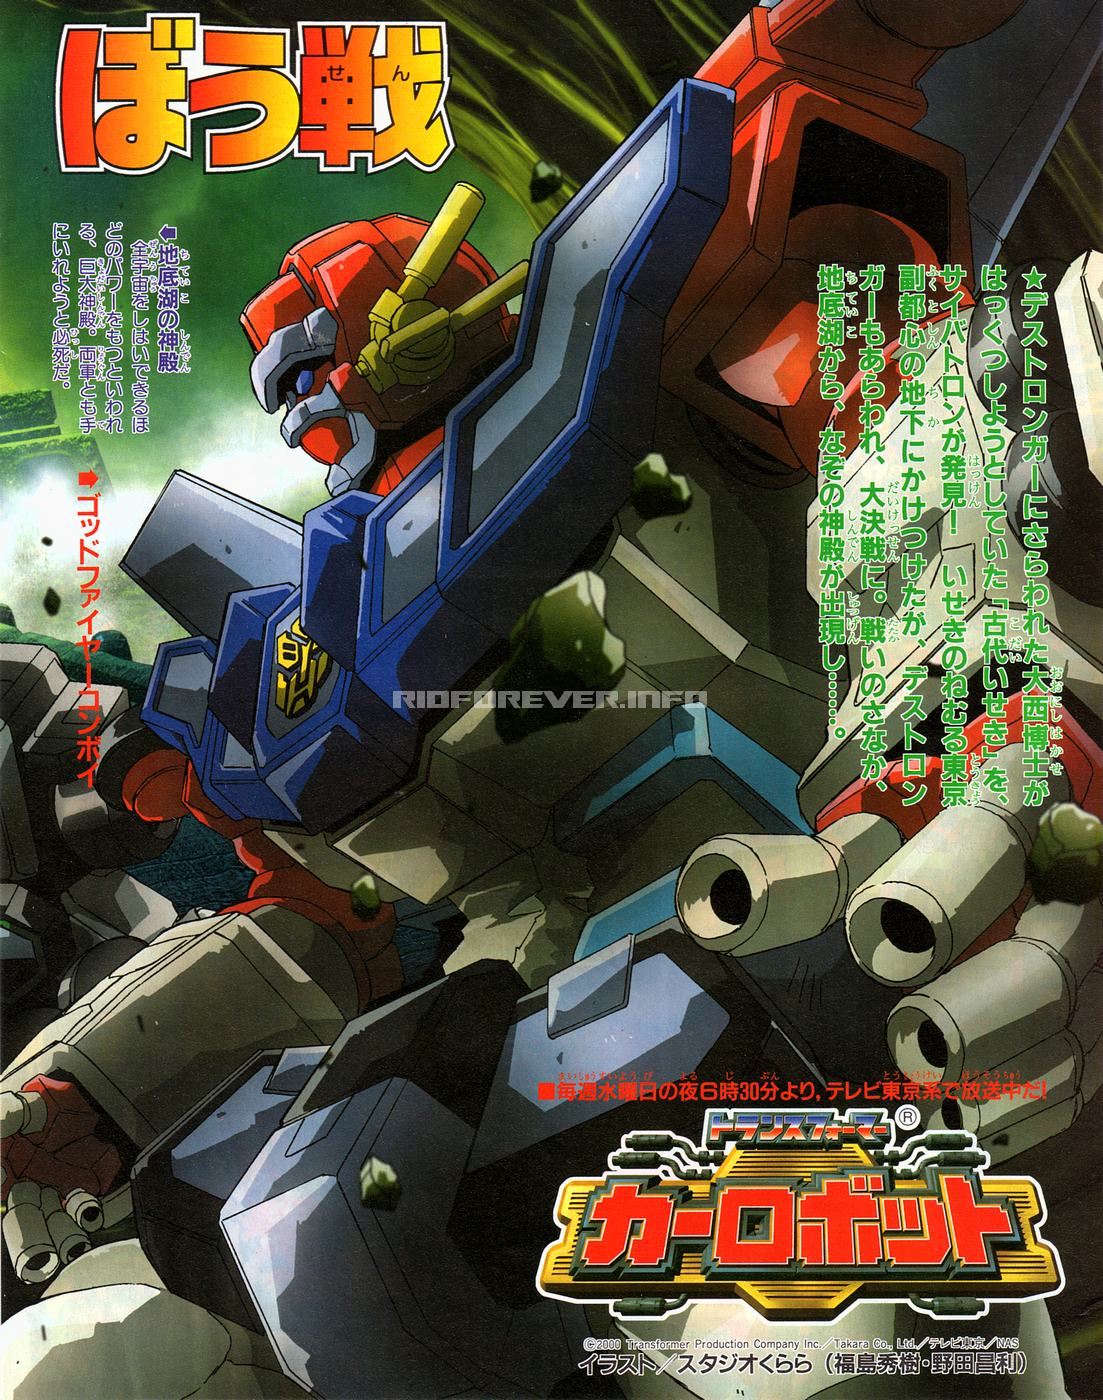 TV Magazine 2000-11-6-1